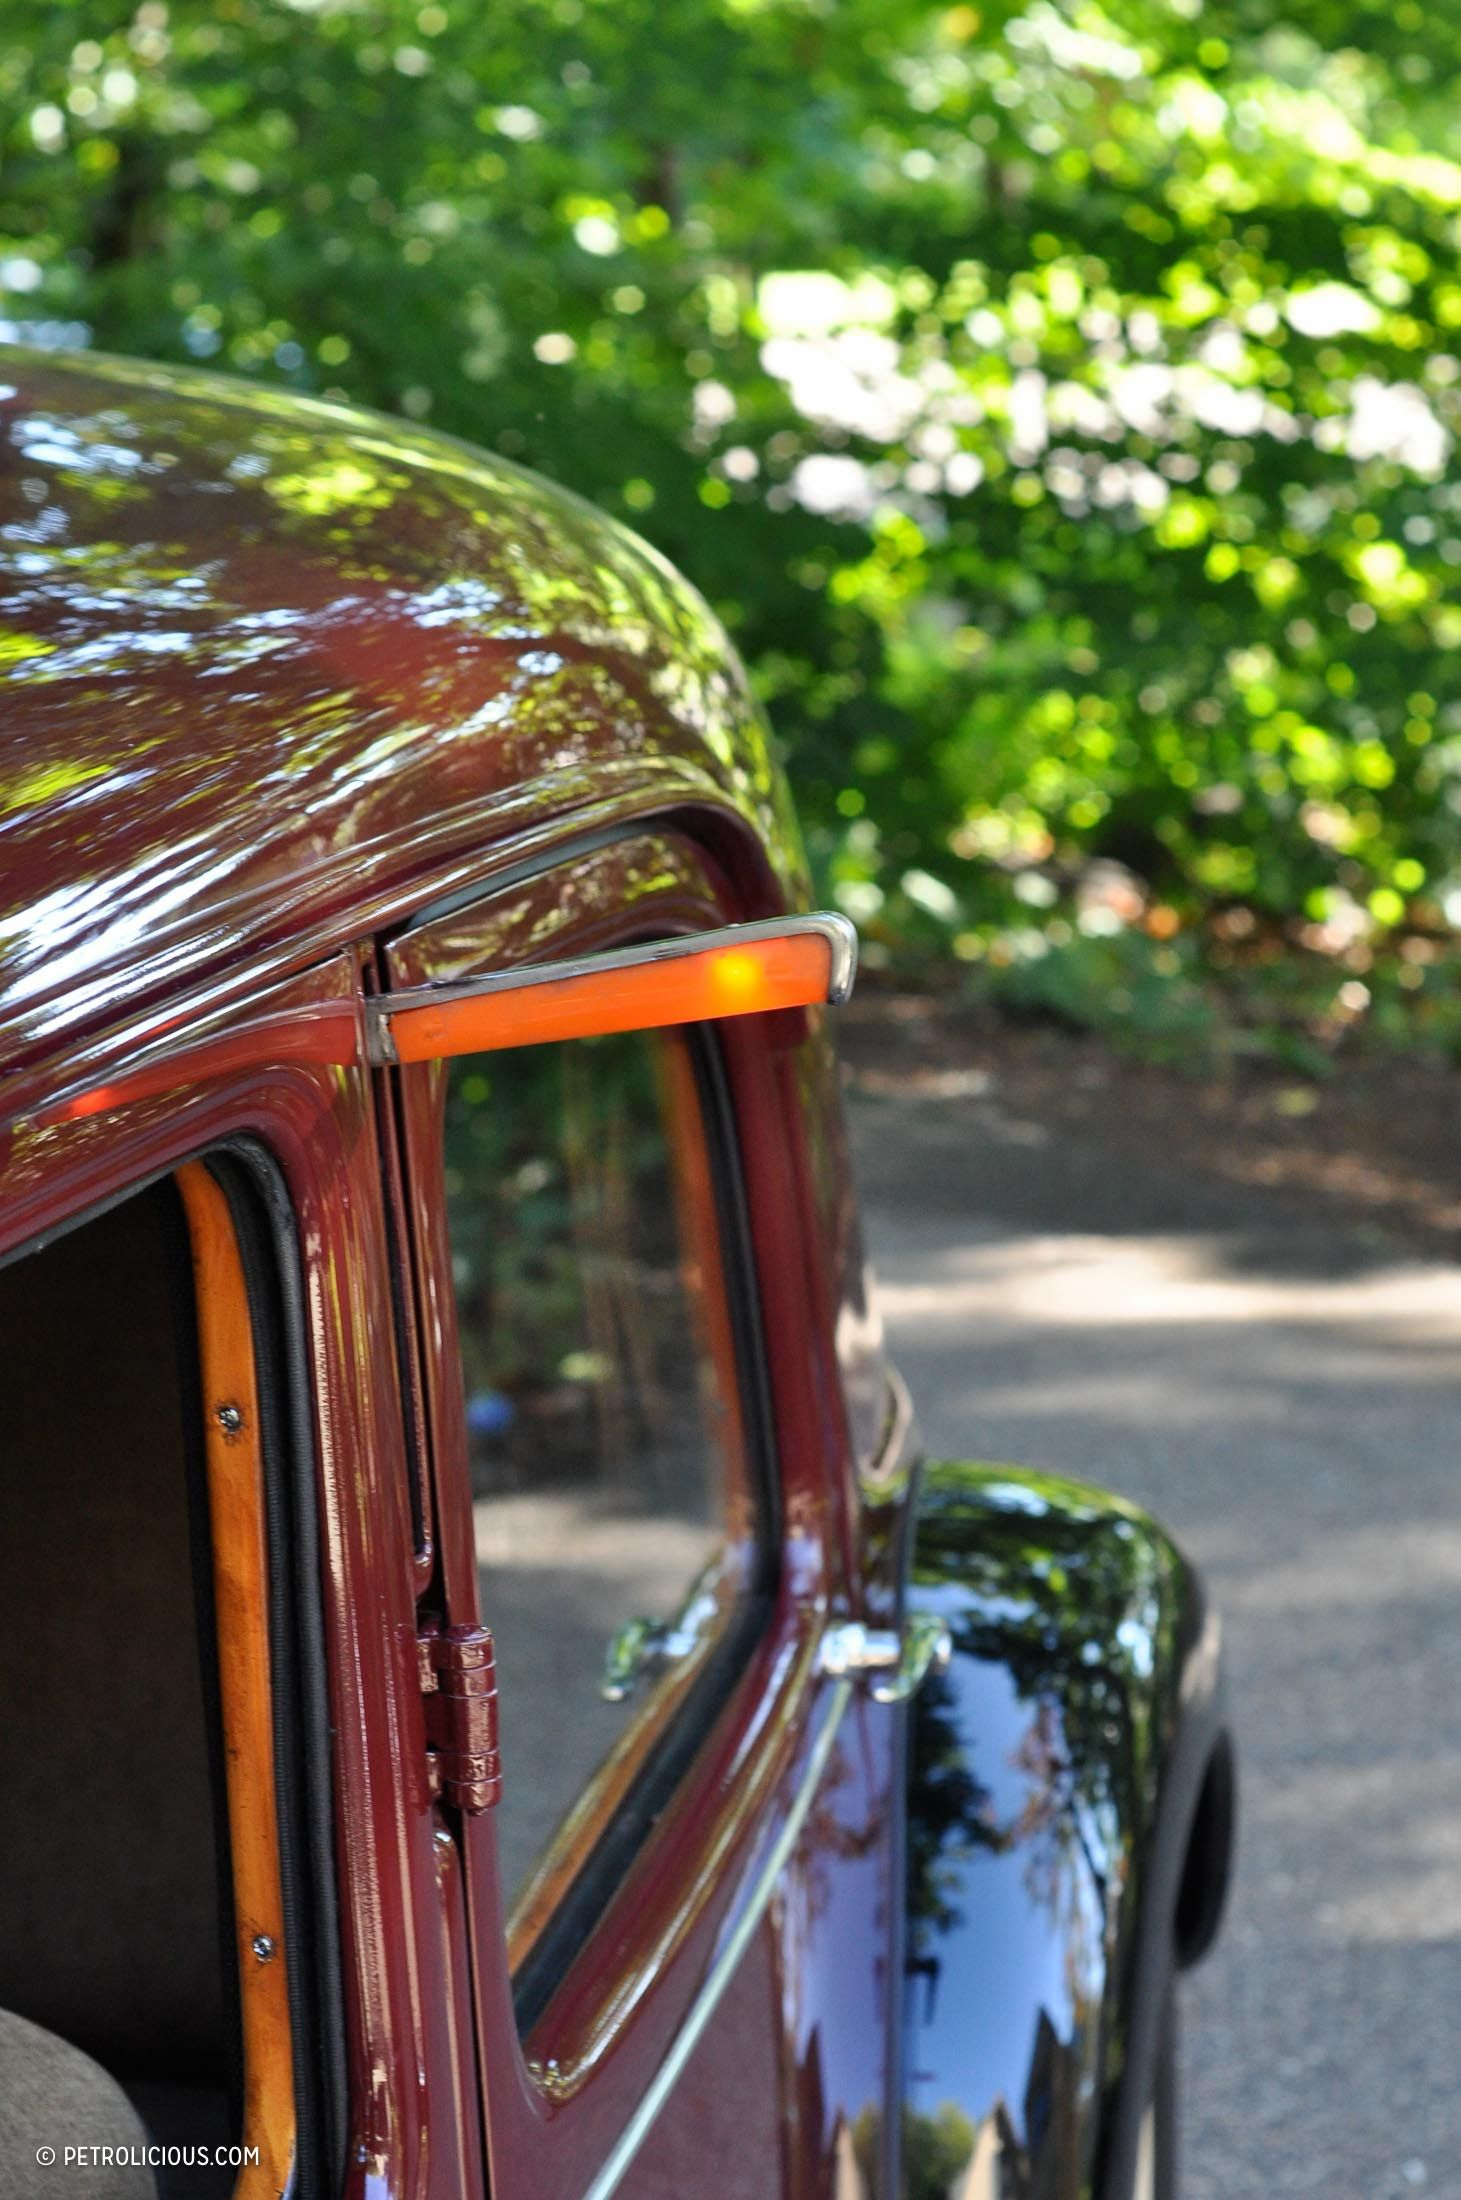 The Art Deco Beauty of Citroën's Traction Avant | Petrolicious